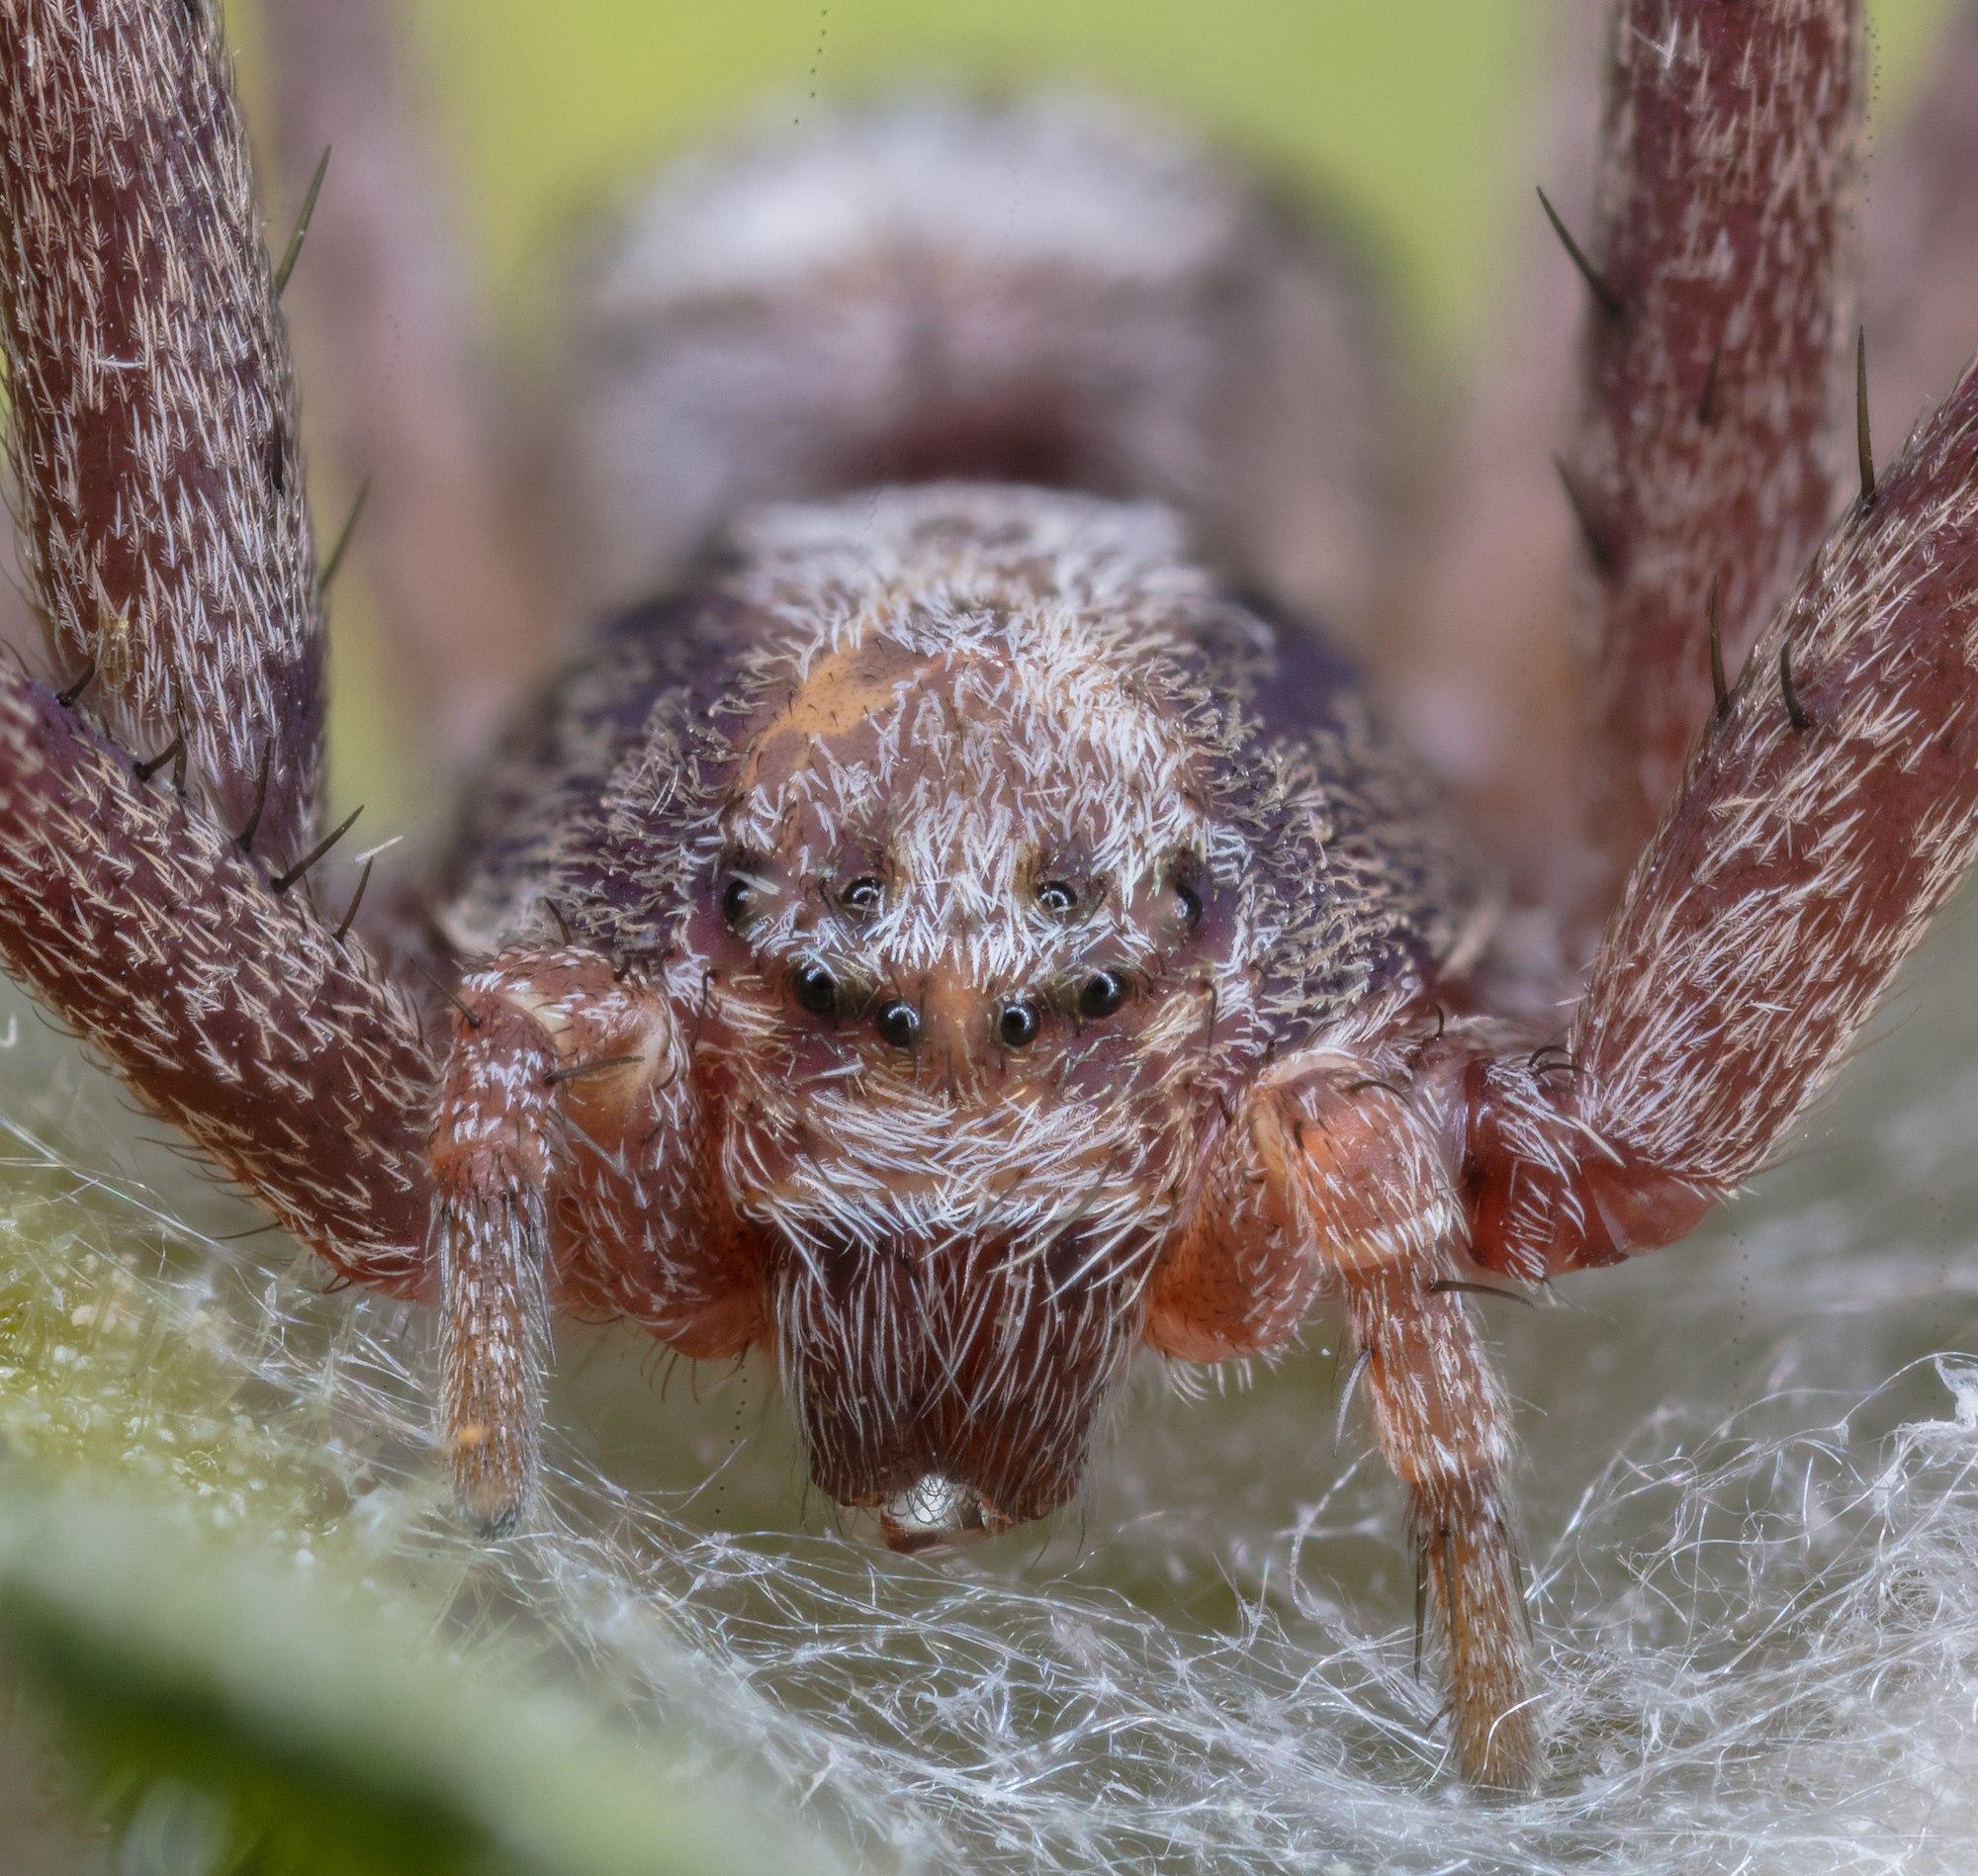 Wandering crab spider (Philodromus aureolus), Hartelholz, Munich, Germany